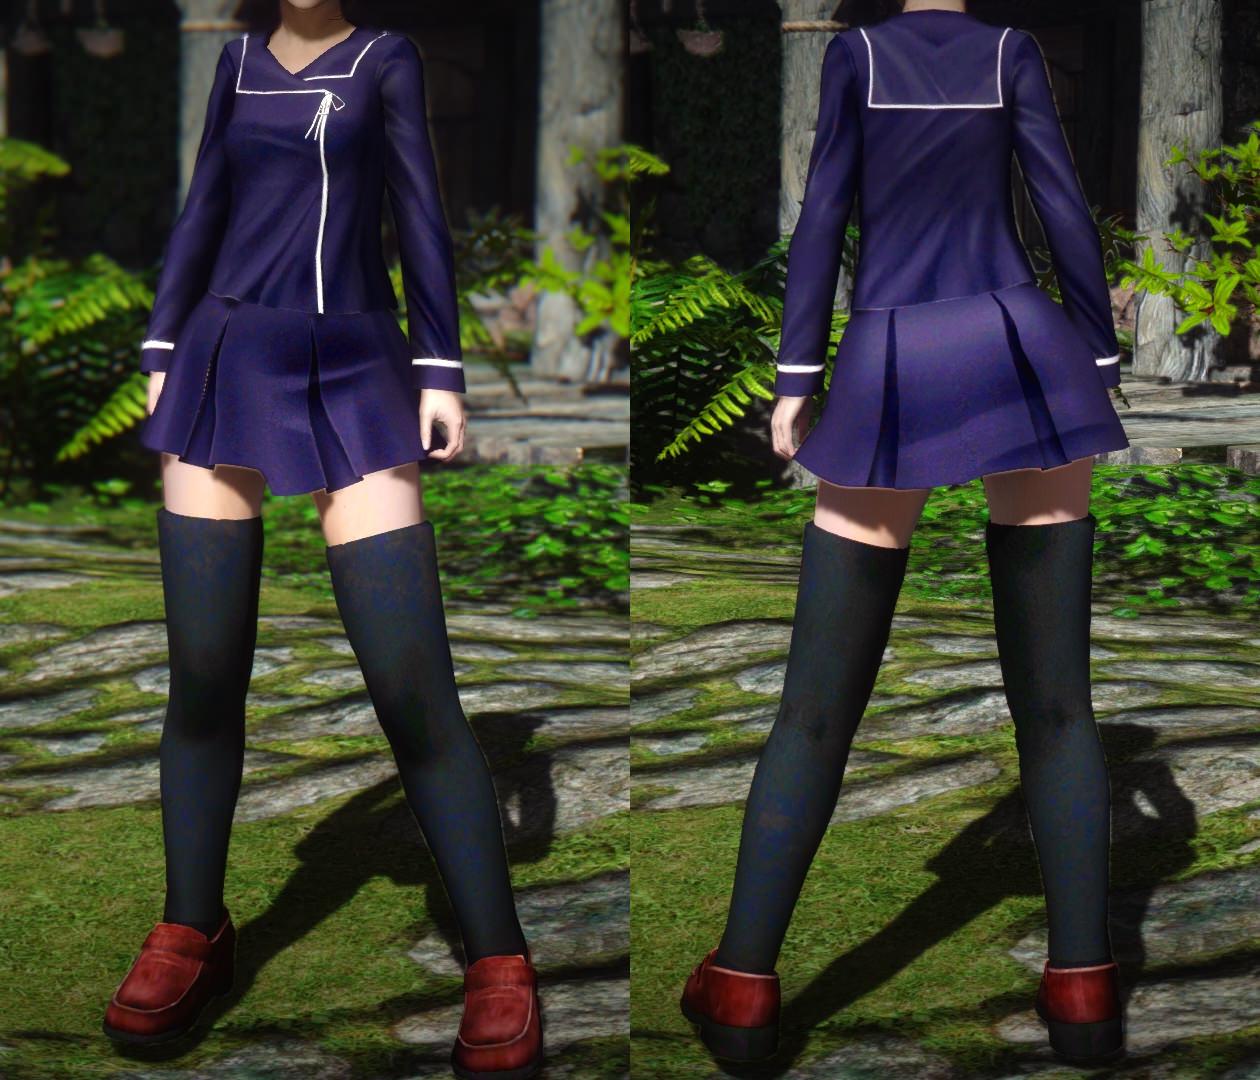 Hentai_SchoolGirl_Uniform_CBBE_2.jpg